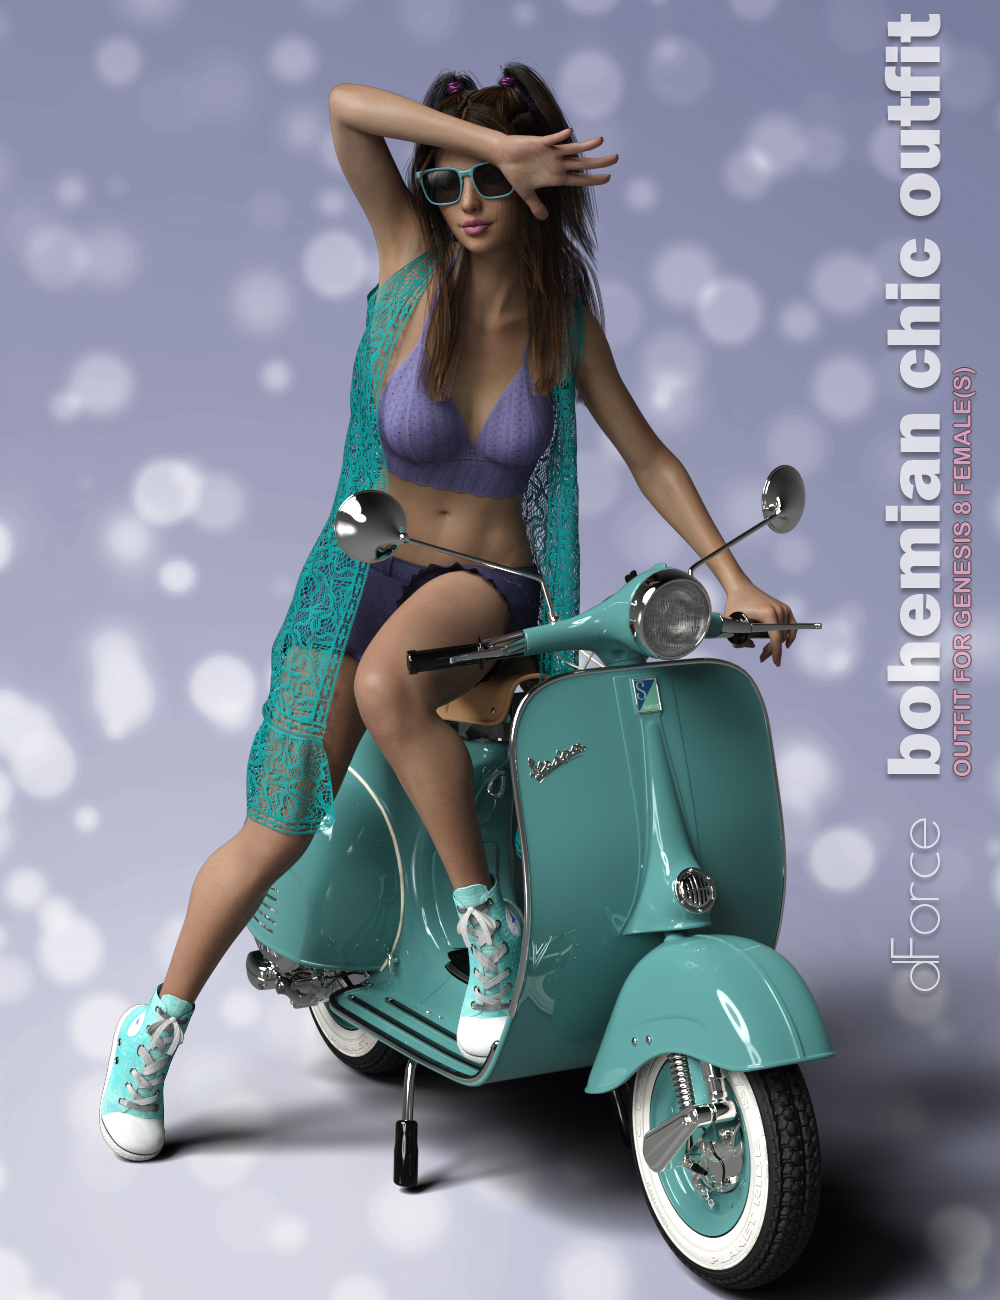 dForce P3D Bohemian Chic Outfit for Genesis 8 Female(s) by: P3Design, 3D Models by Daz 3D